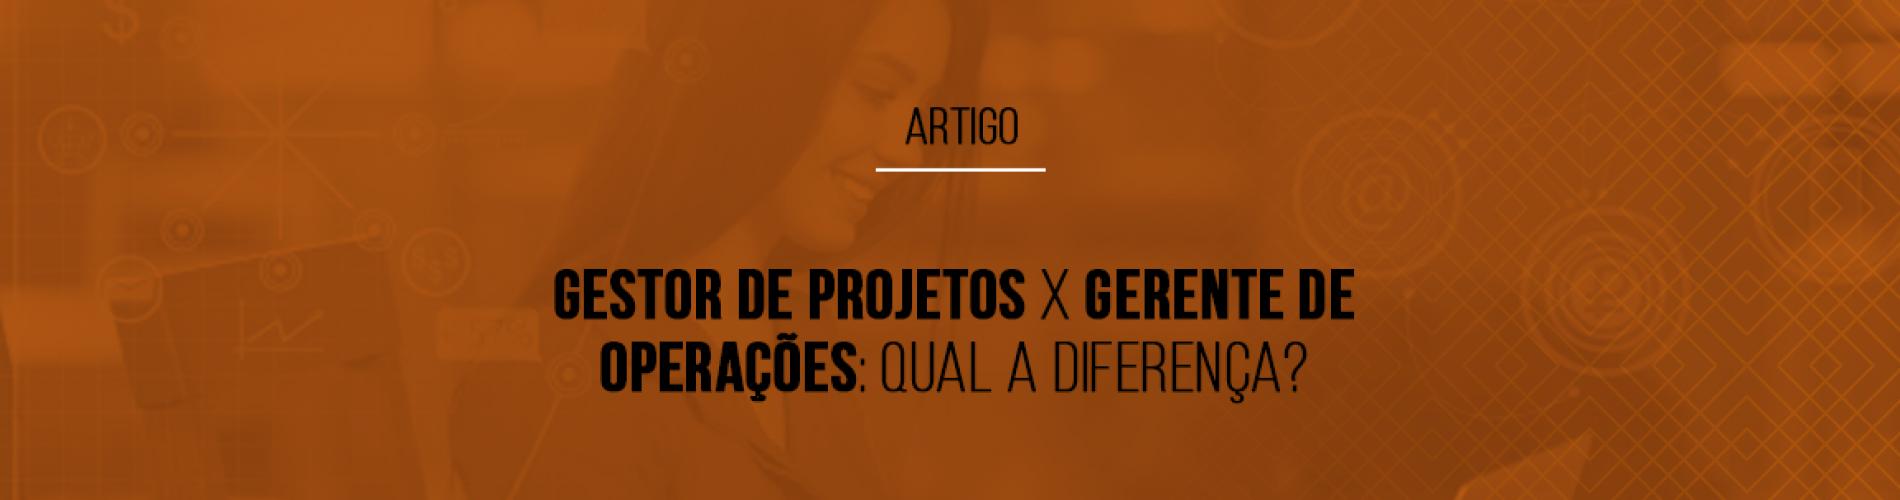 gestor-de-projetos-x-gerente-de-operacoes-qual-a-diferenca